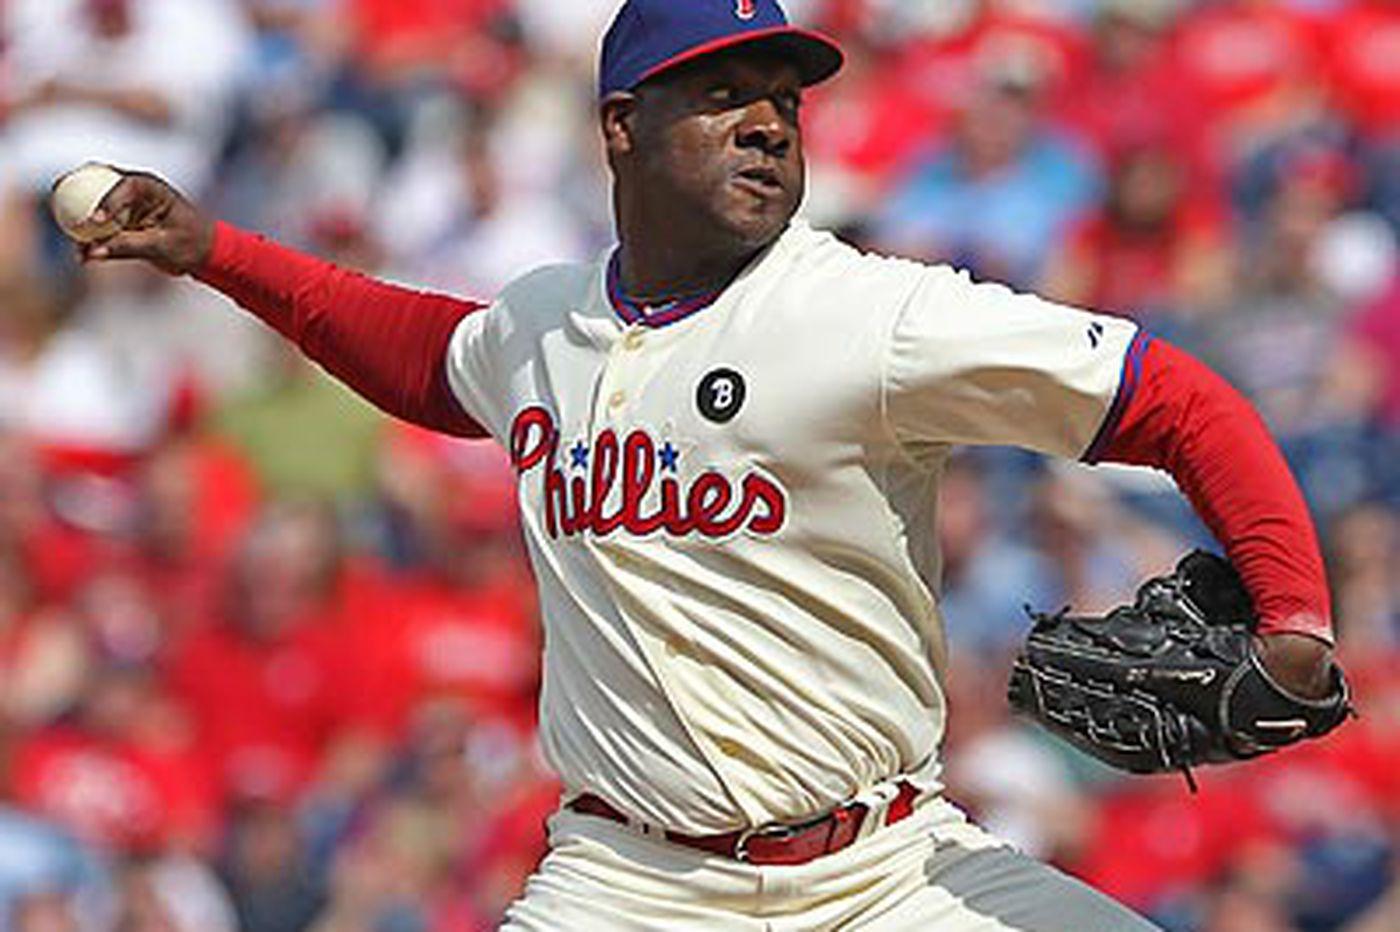 Phillies put Contreras on DL